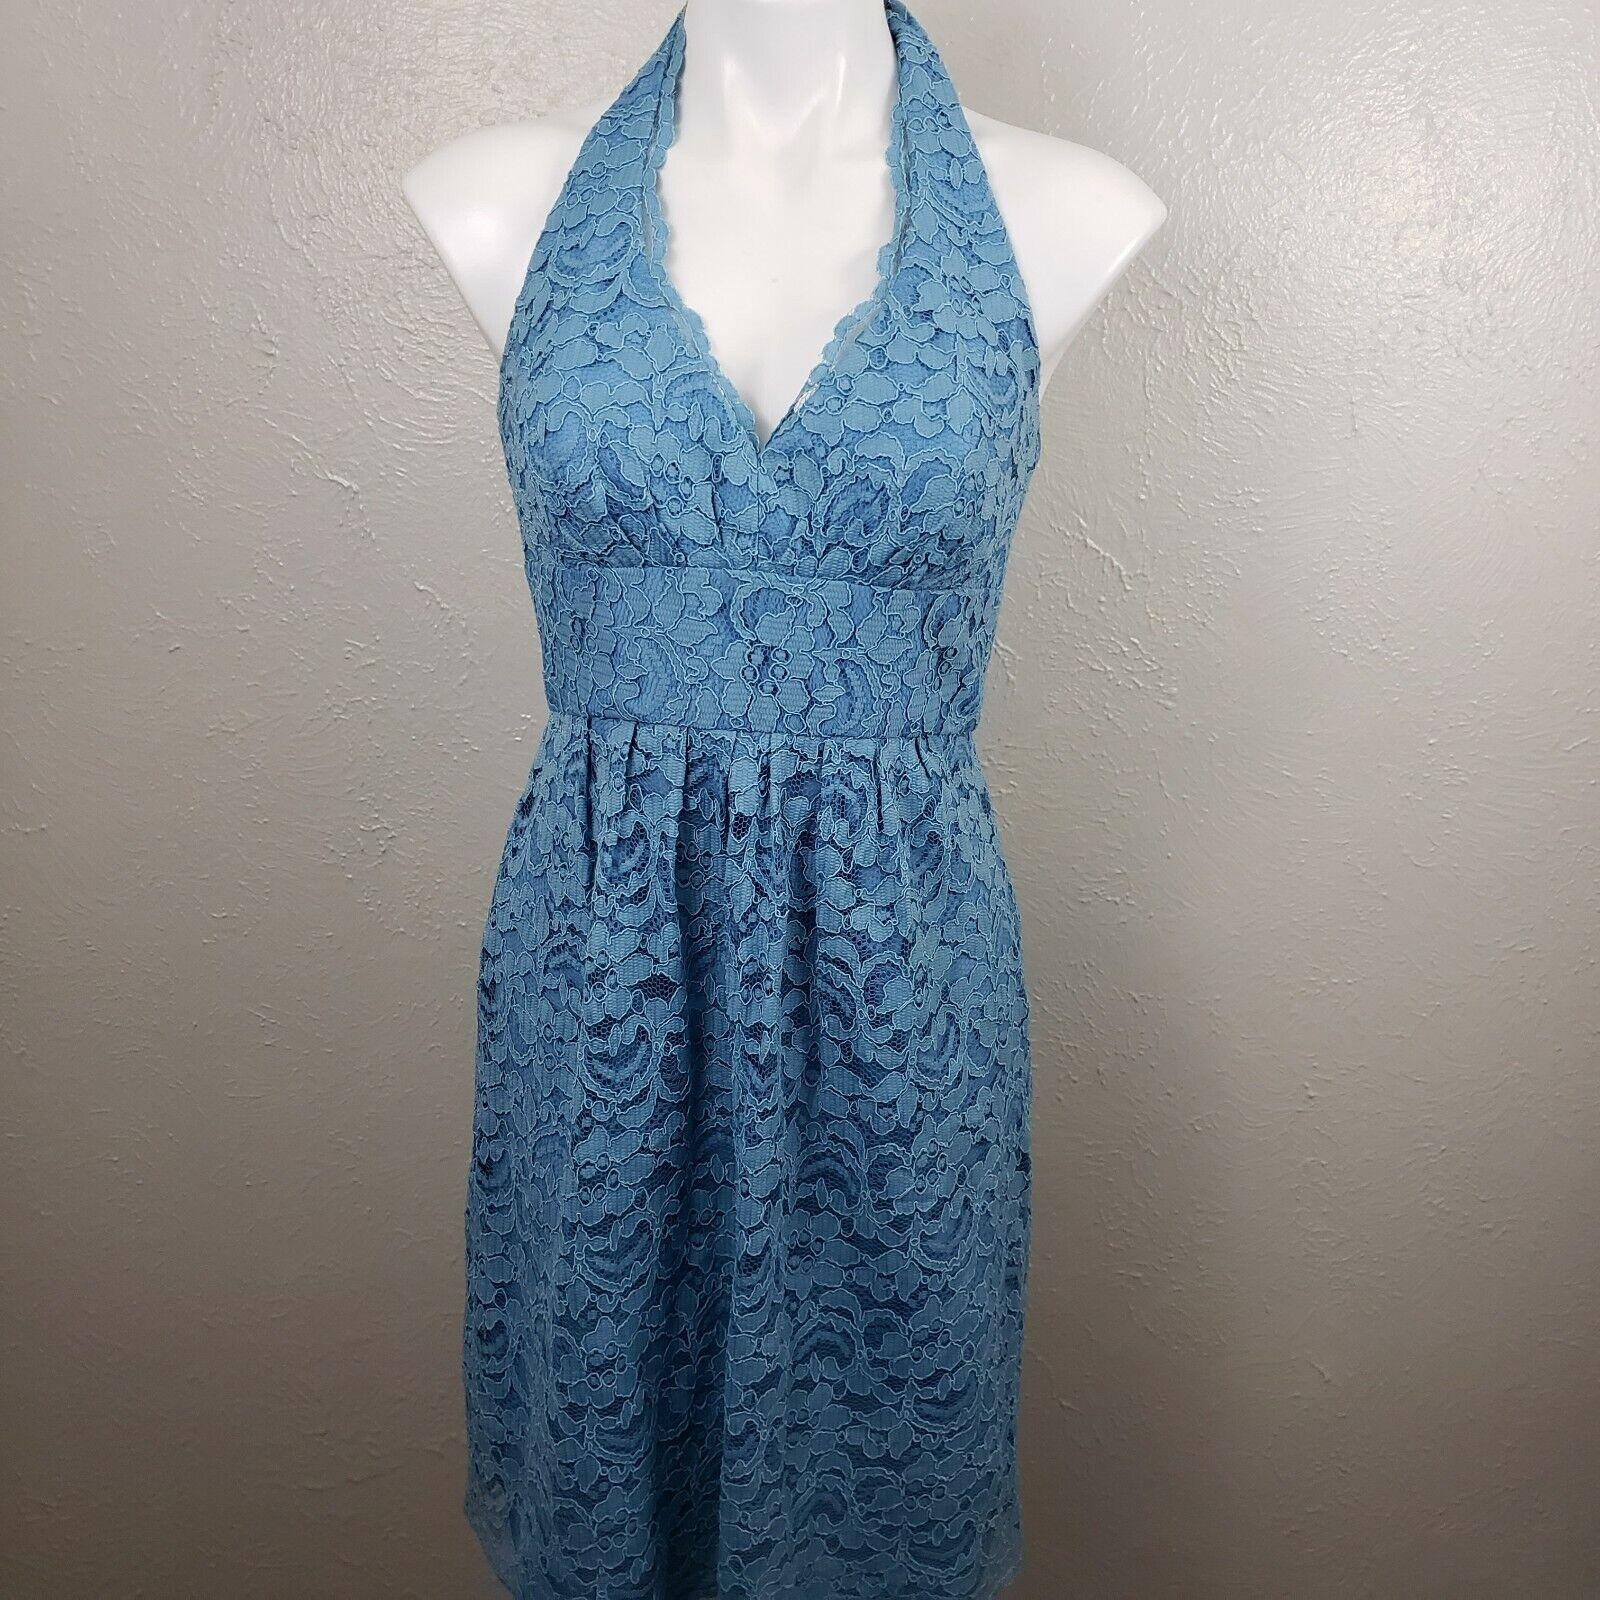 Davids Bridal F15623 blue Halter Lace Short Bridesmaid Dress sz 8 prom cocktail